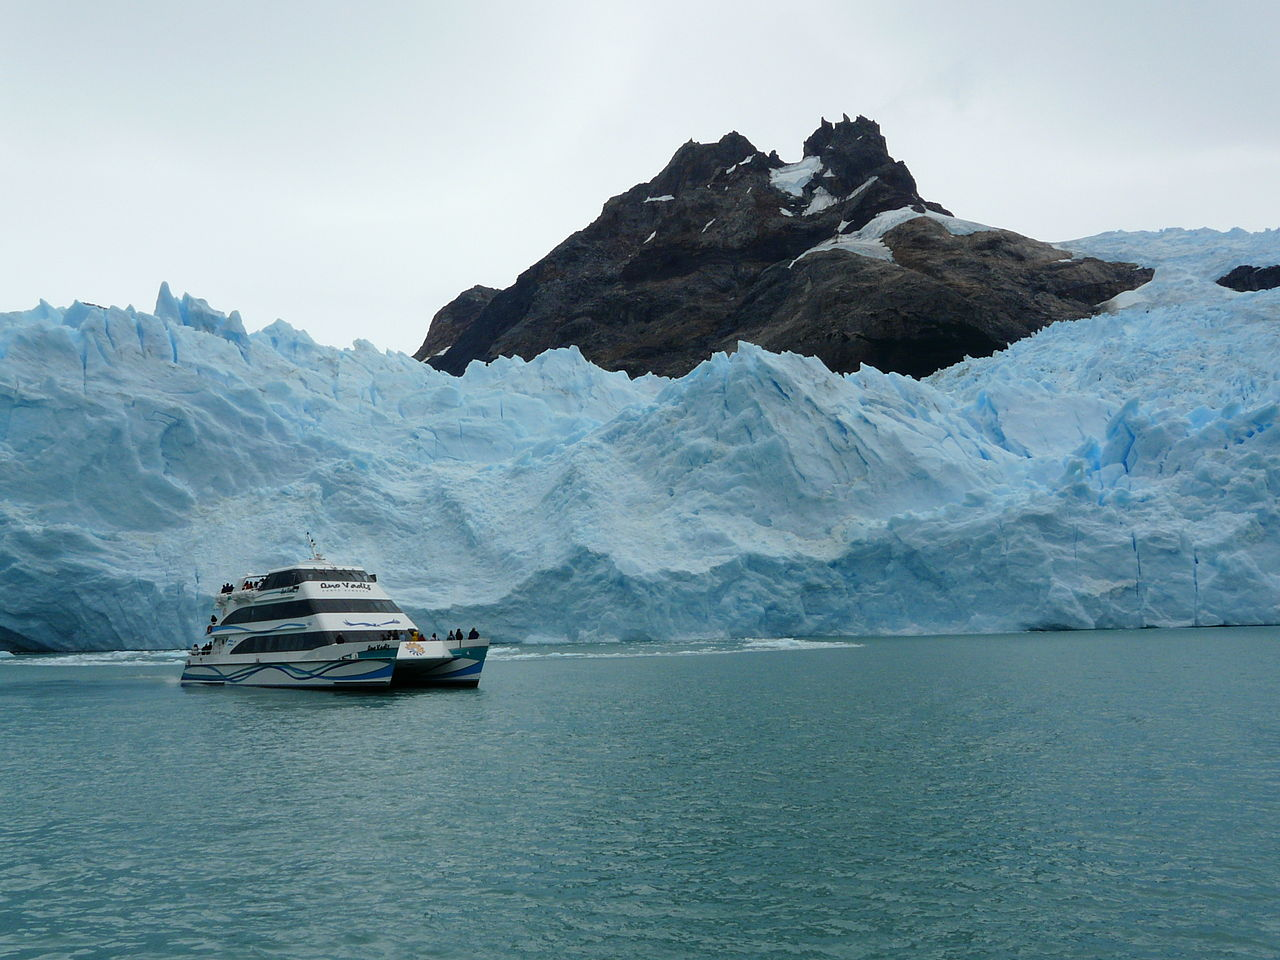 Patagonia South America >> Original file  (3,264 × 2,448 pixels, file size: 3.51 MB, MIME type: image/jpeg )